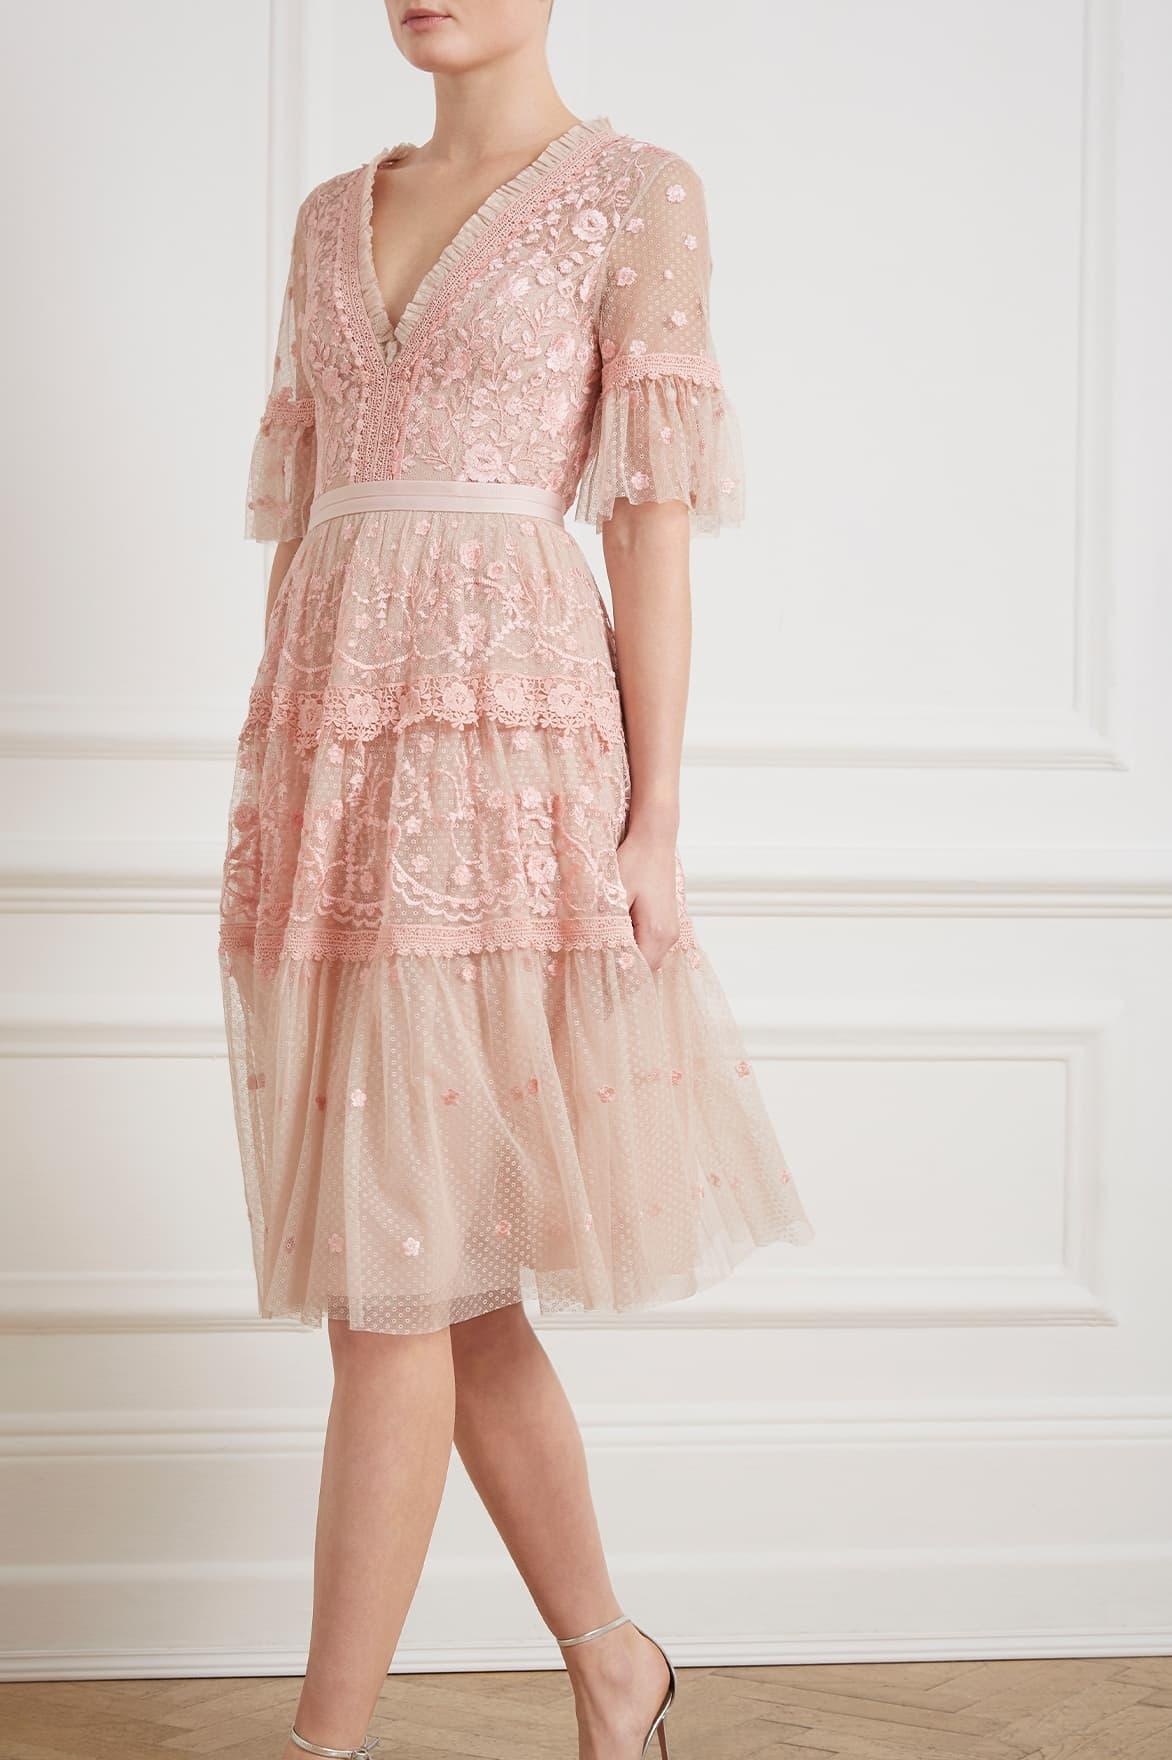 b209846d9322 Needle & Thread Midsummer Lace Dress in Pink - Lyst